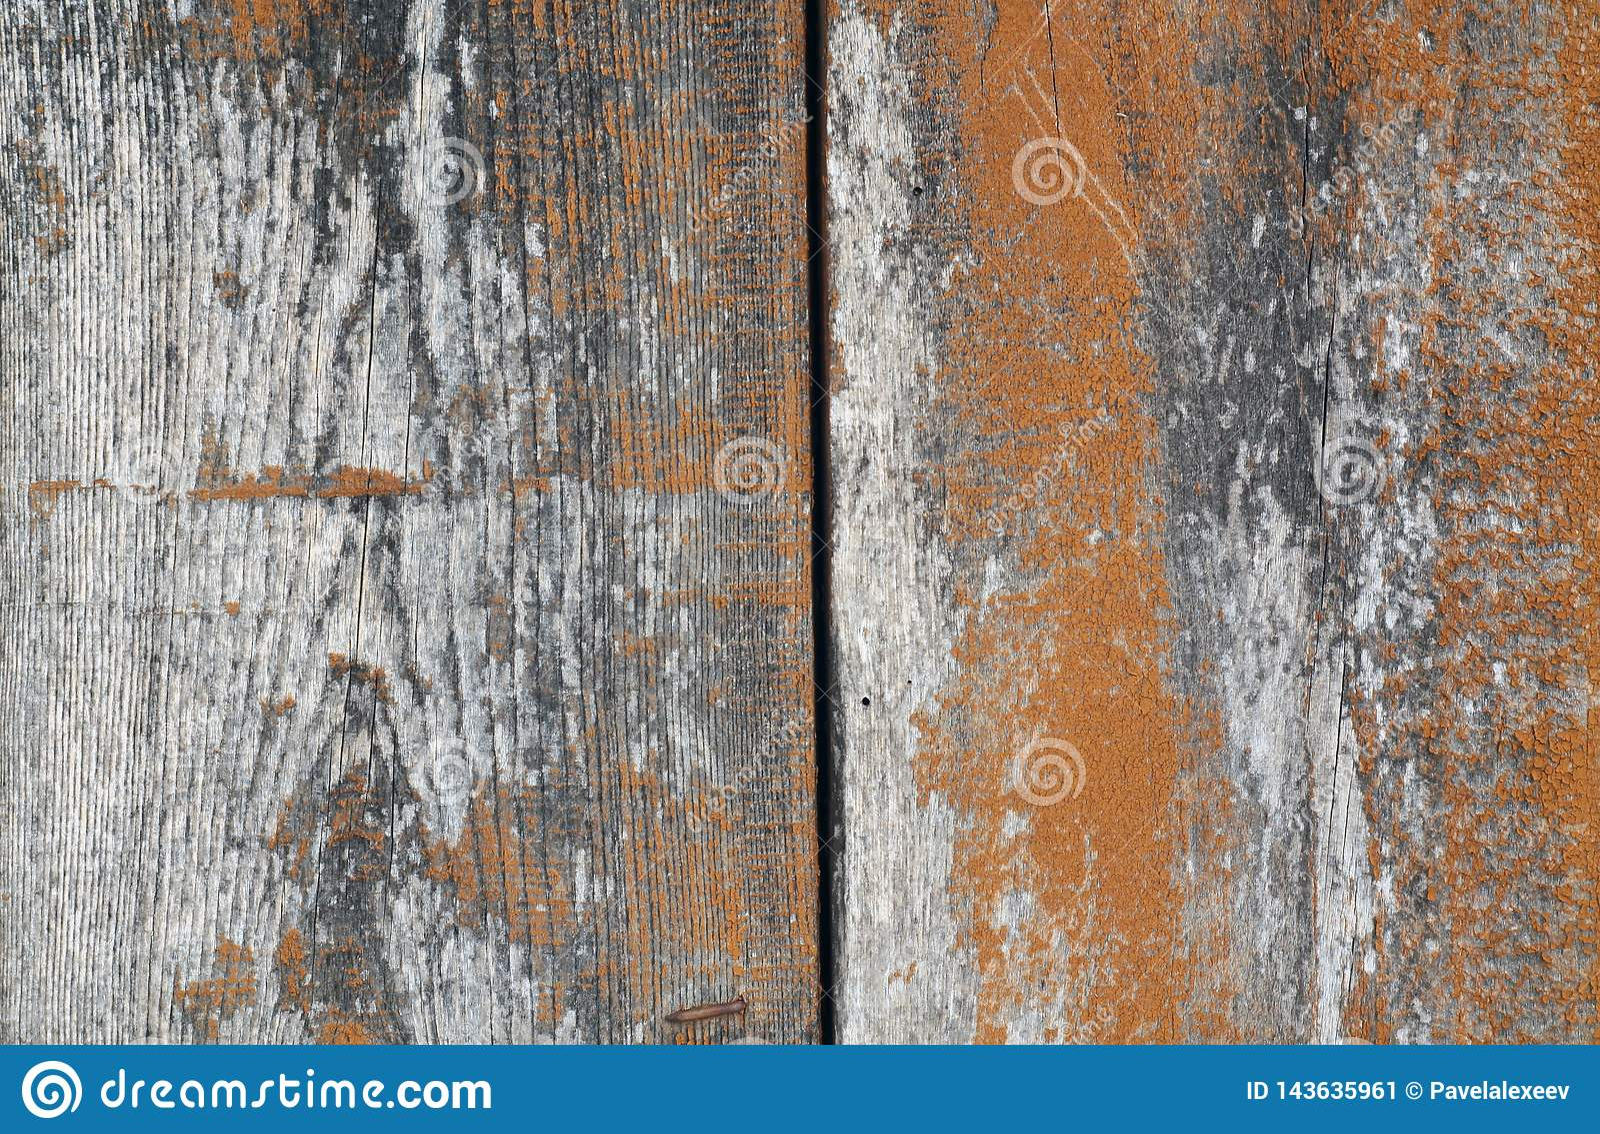 Orange color old grungy wooden planks background